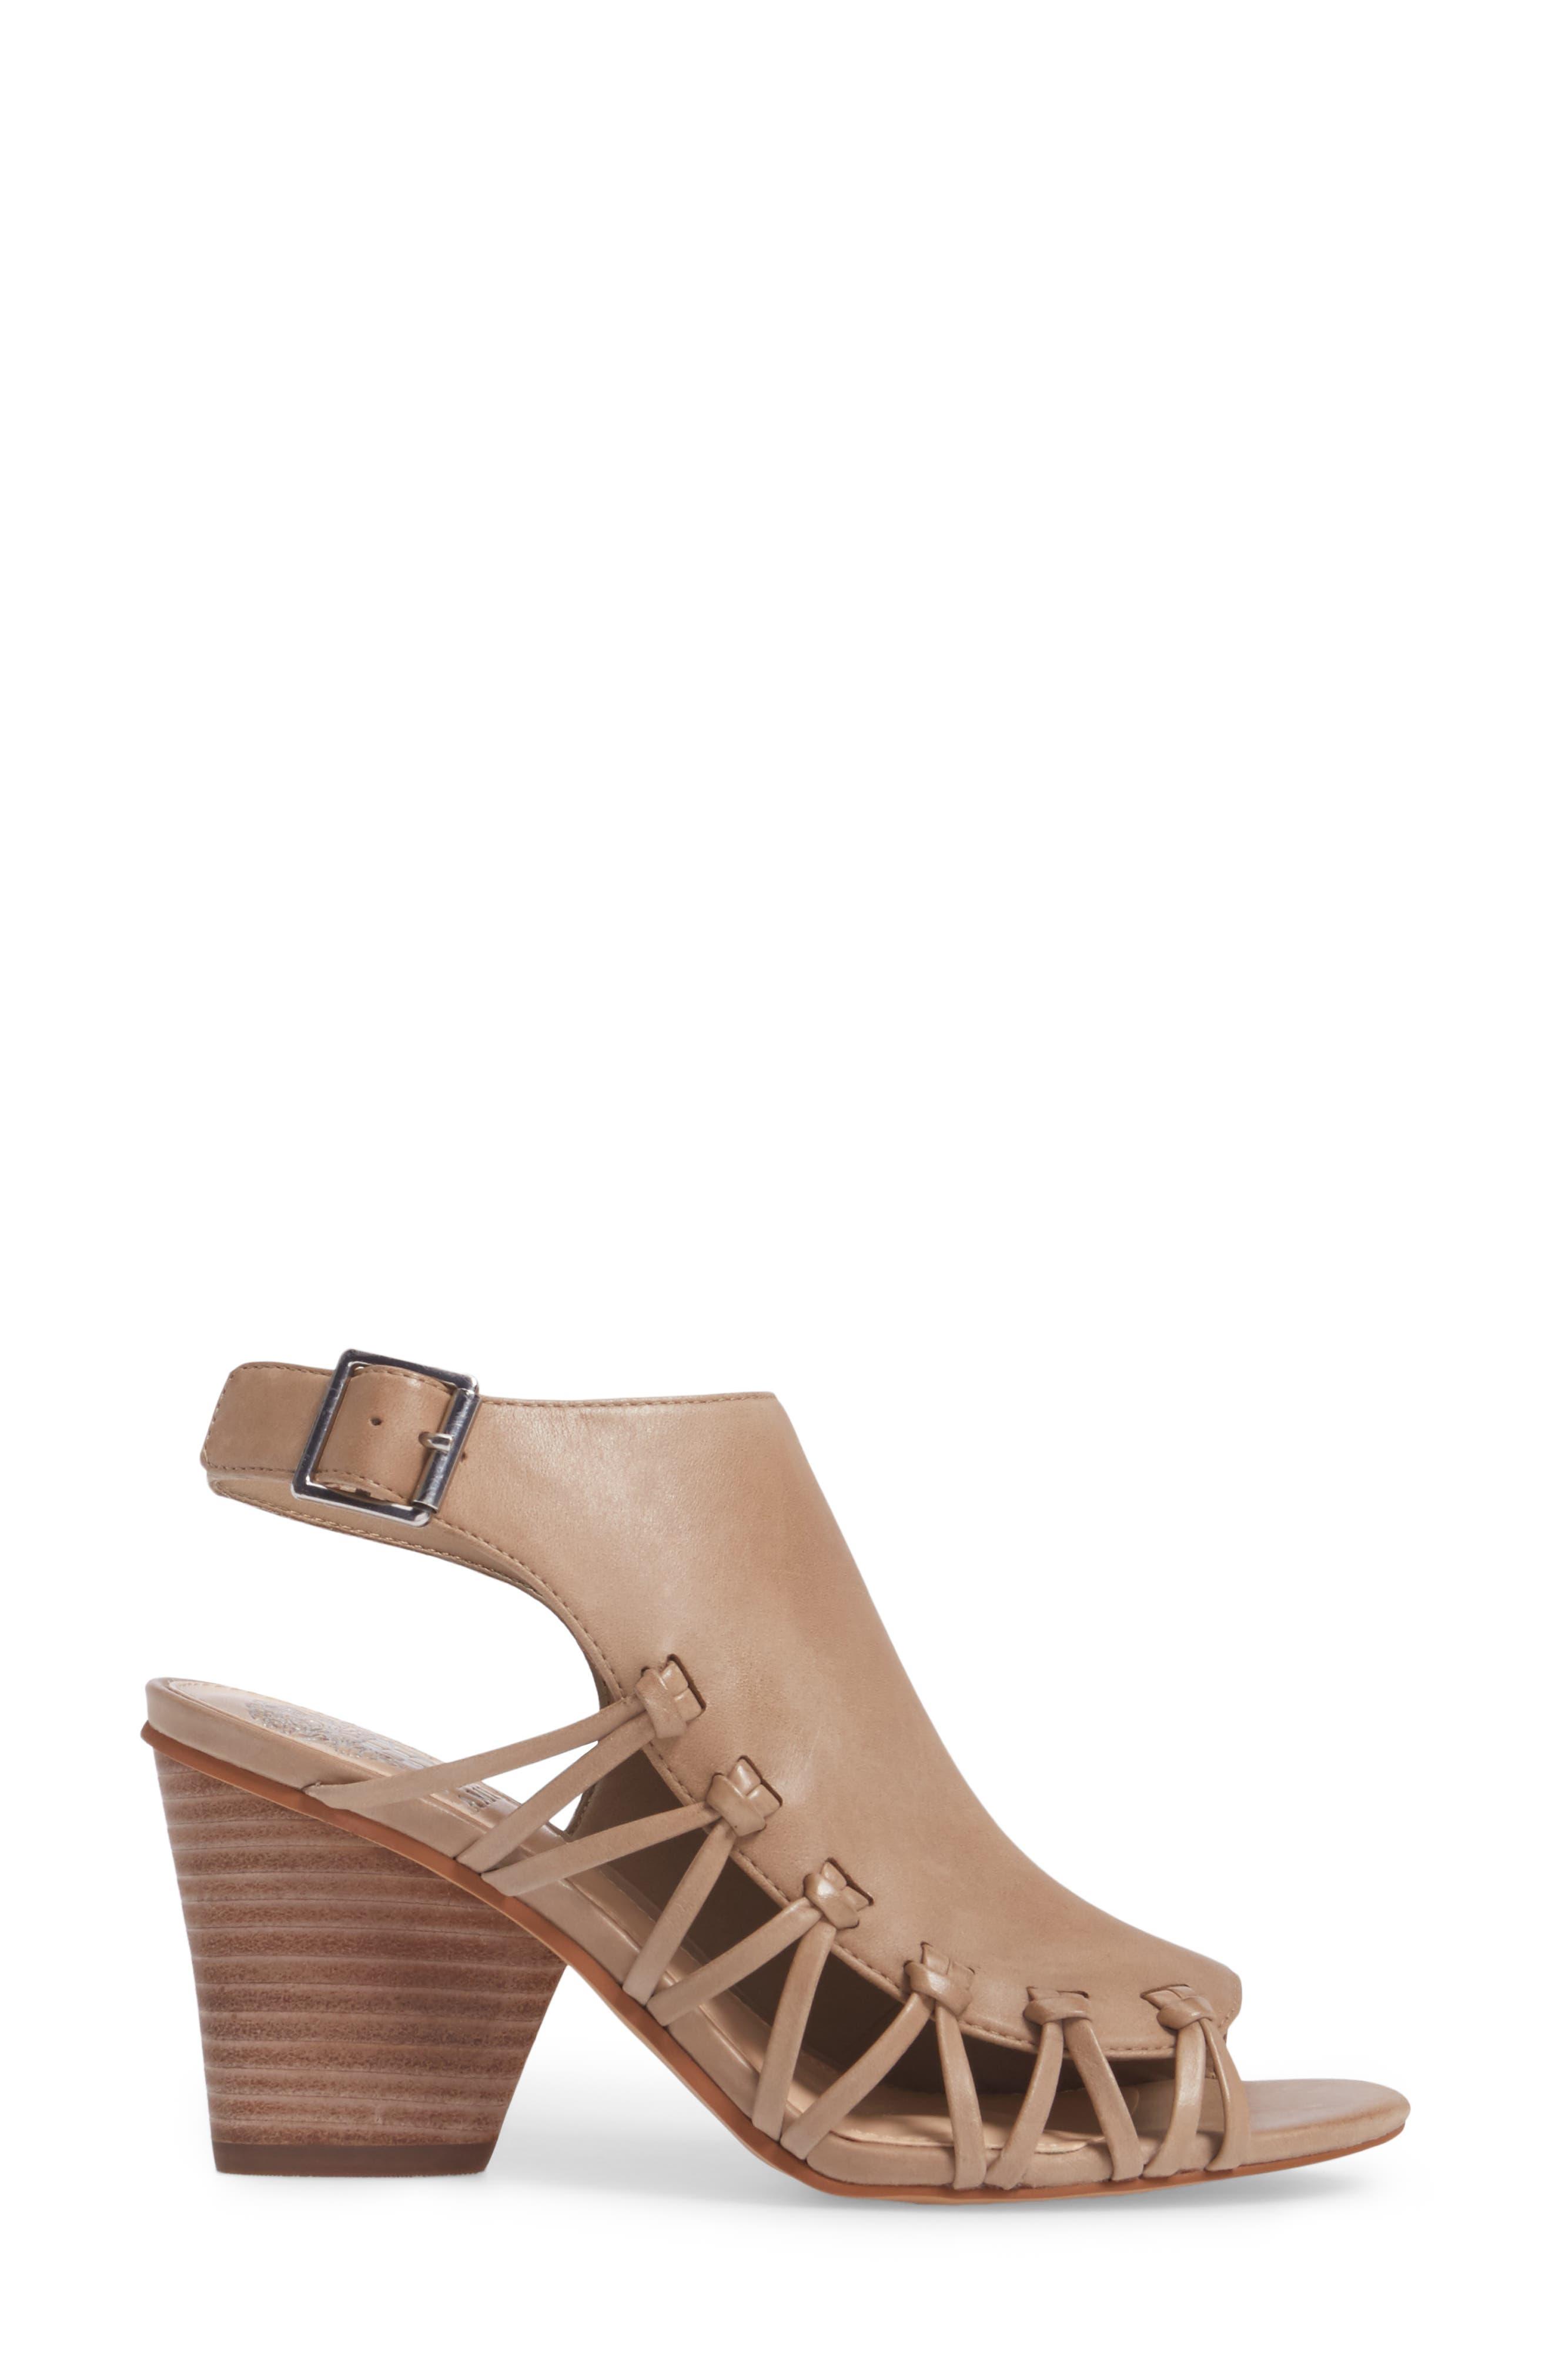 Ankara Sandal,                             Alternate thumbnail 3, color,                             Urban Beige Leather